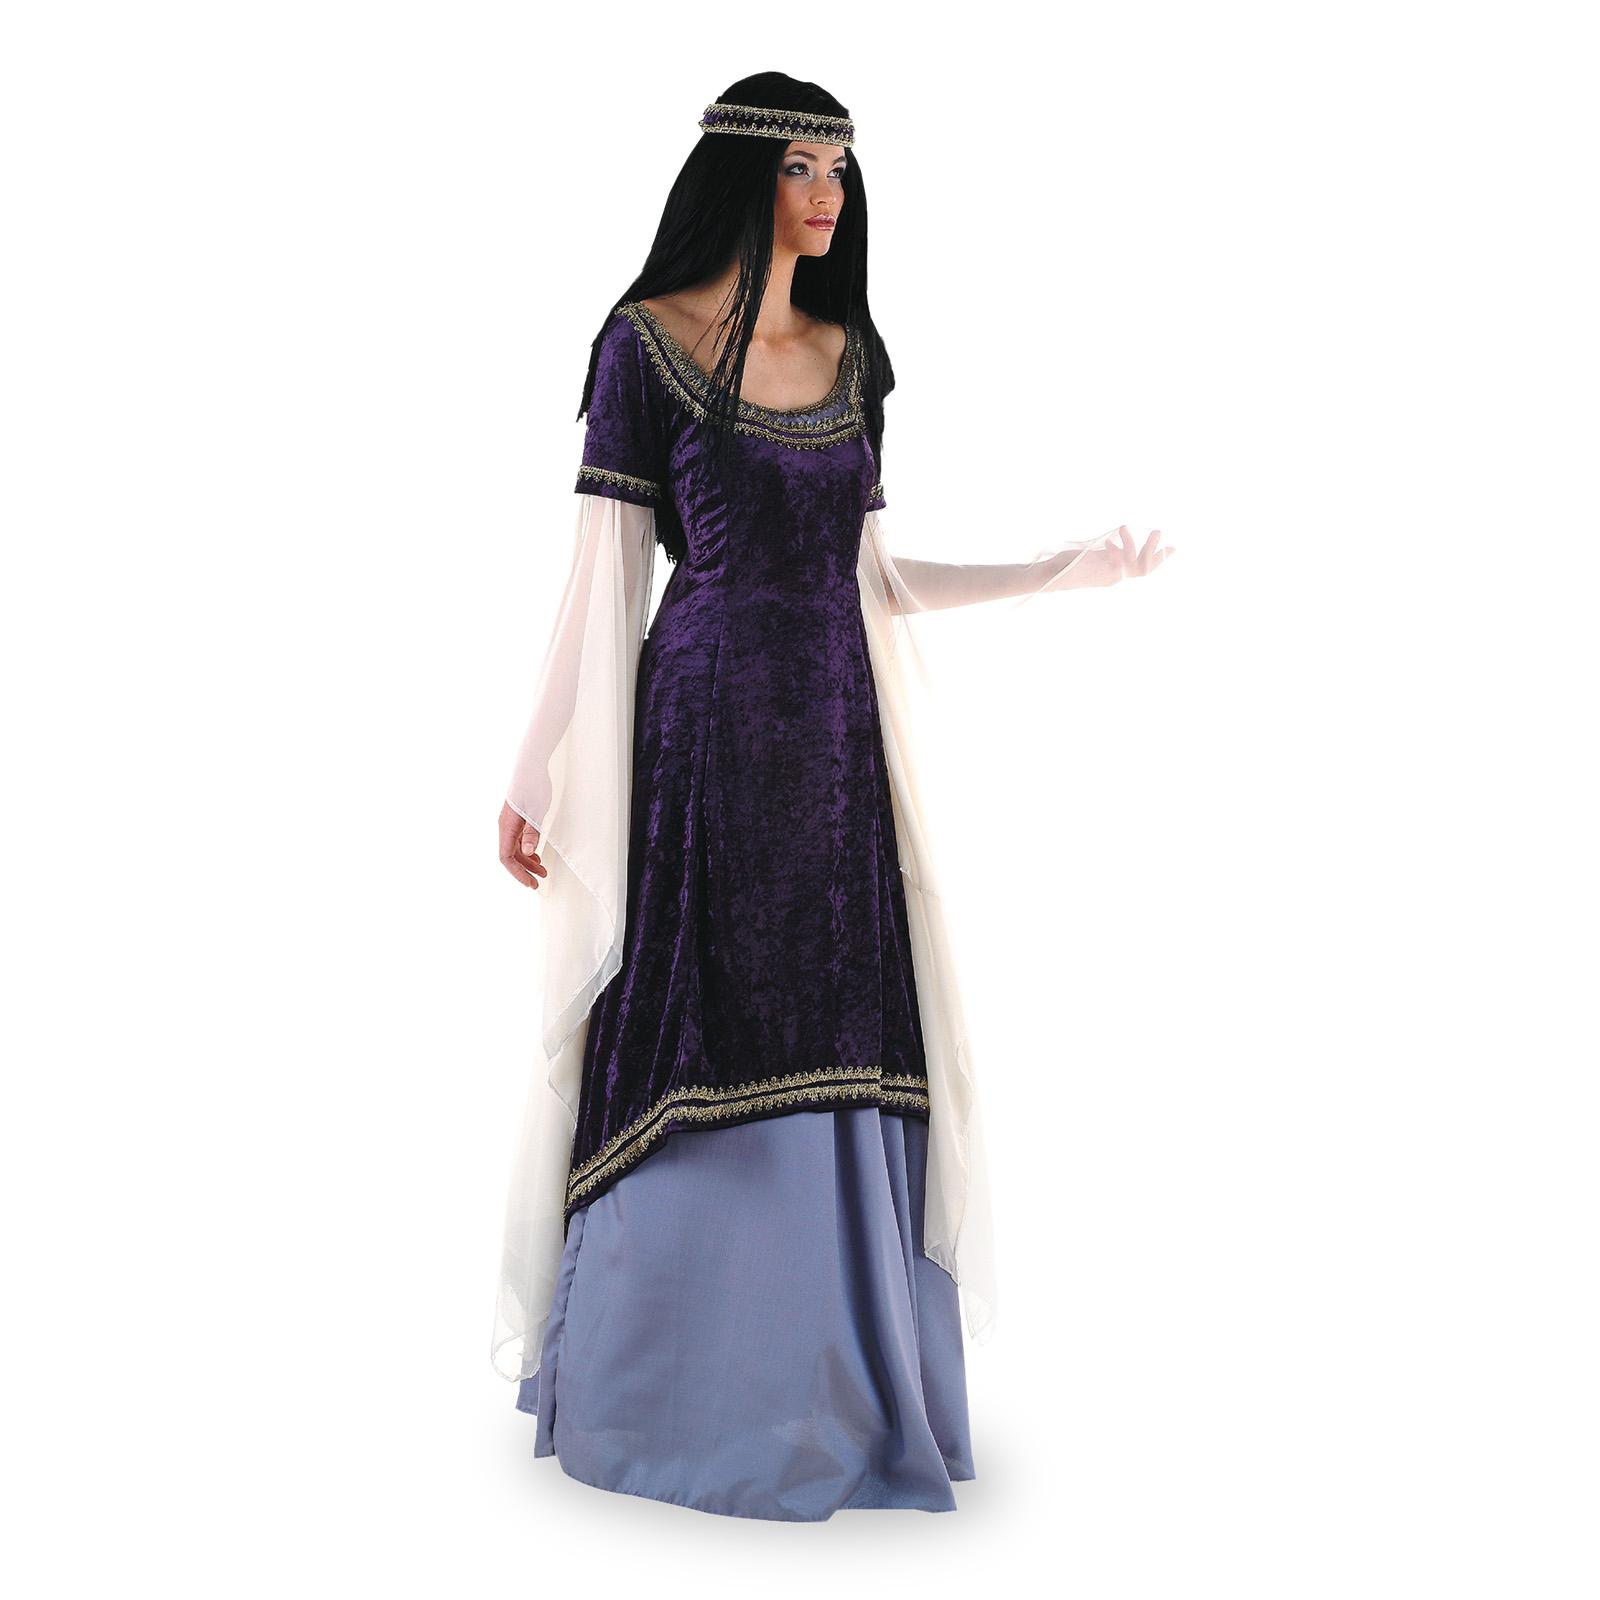 Elbenprinzessin - Kostüm